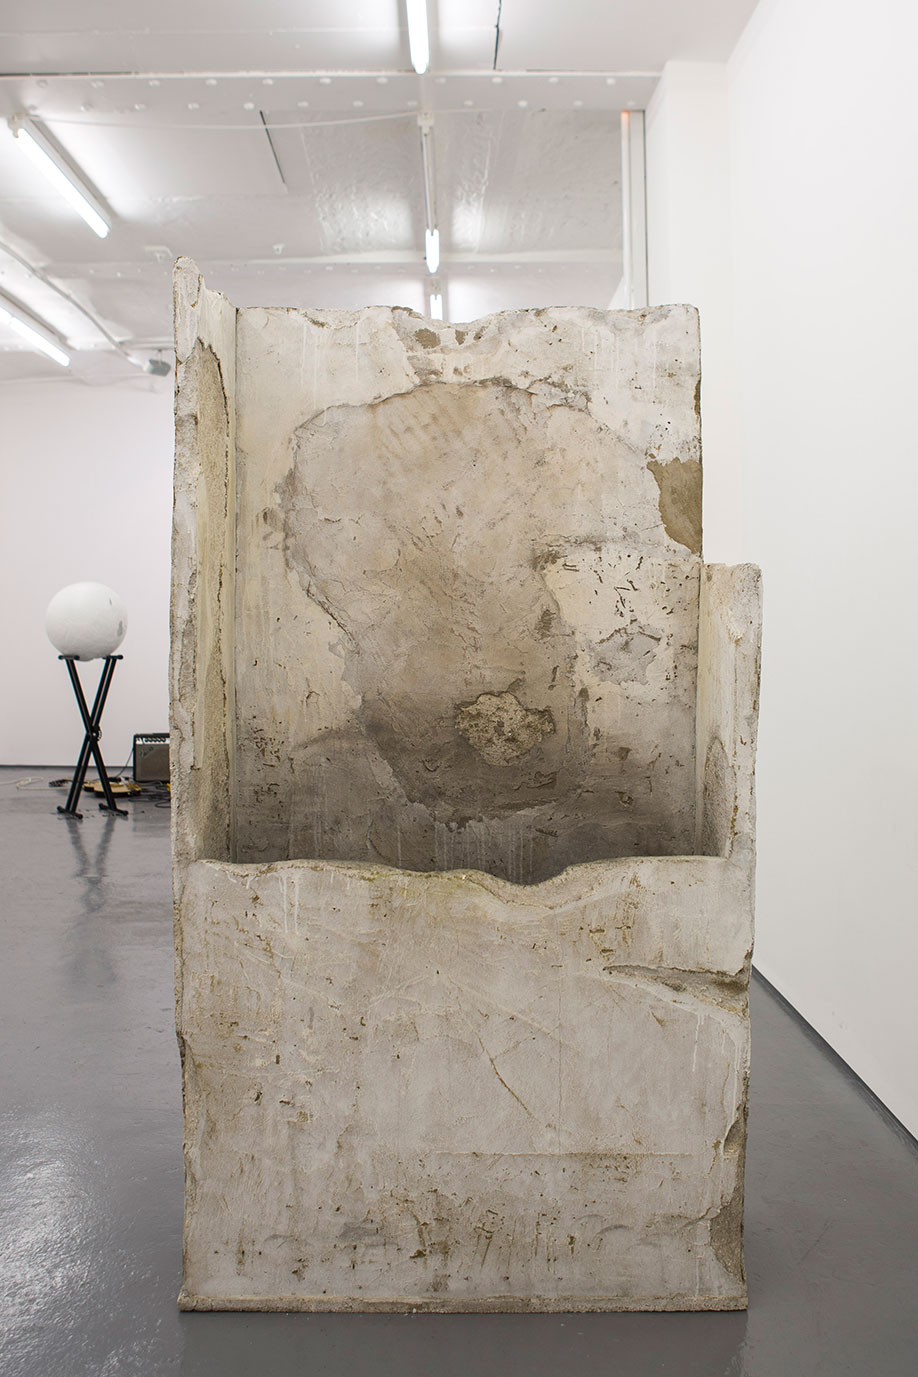 <b>Title:&nbsp;</b>Concrete Container, by Ana Genovés<br /><b>Year:&nbsp;</b>2015<br /><b>Medium:&nbsp;</b>Polystyrene and cement<br /><b>Size:&nbsp;</b>92 x 170 x 37 cm